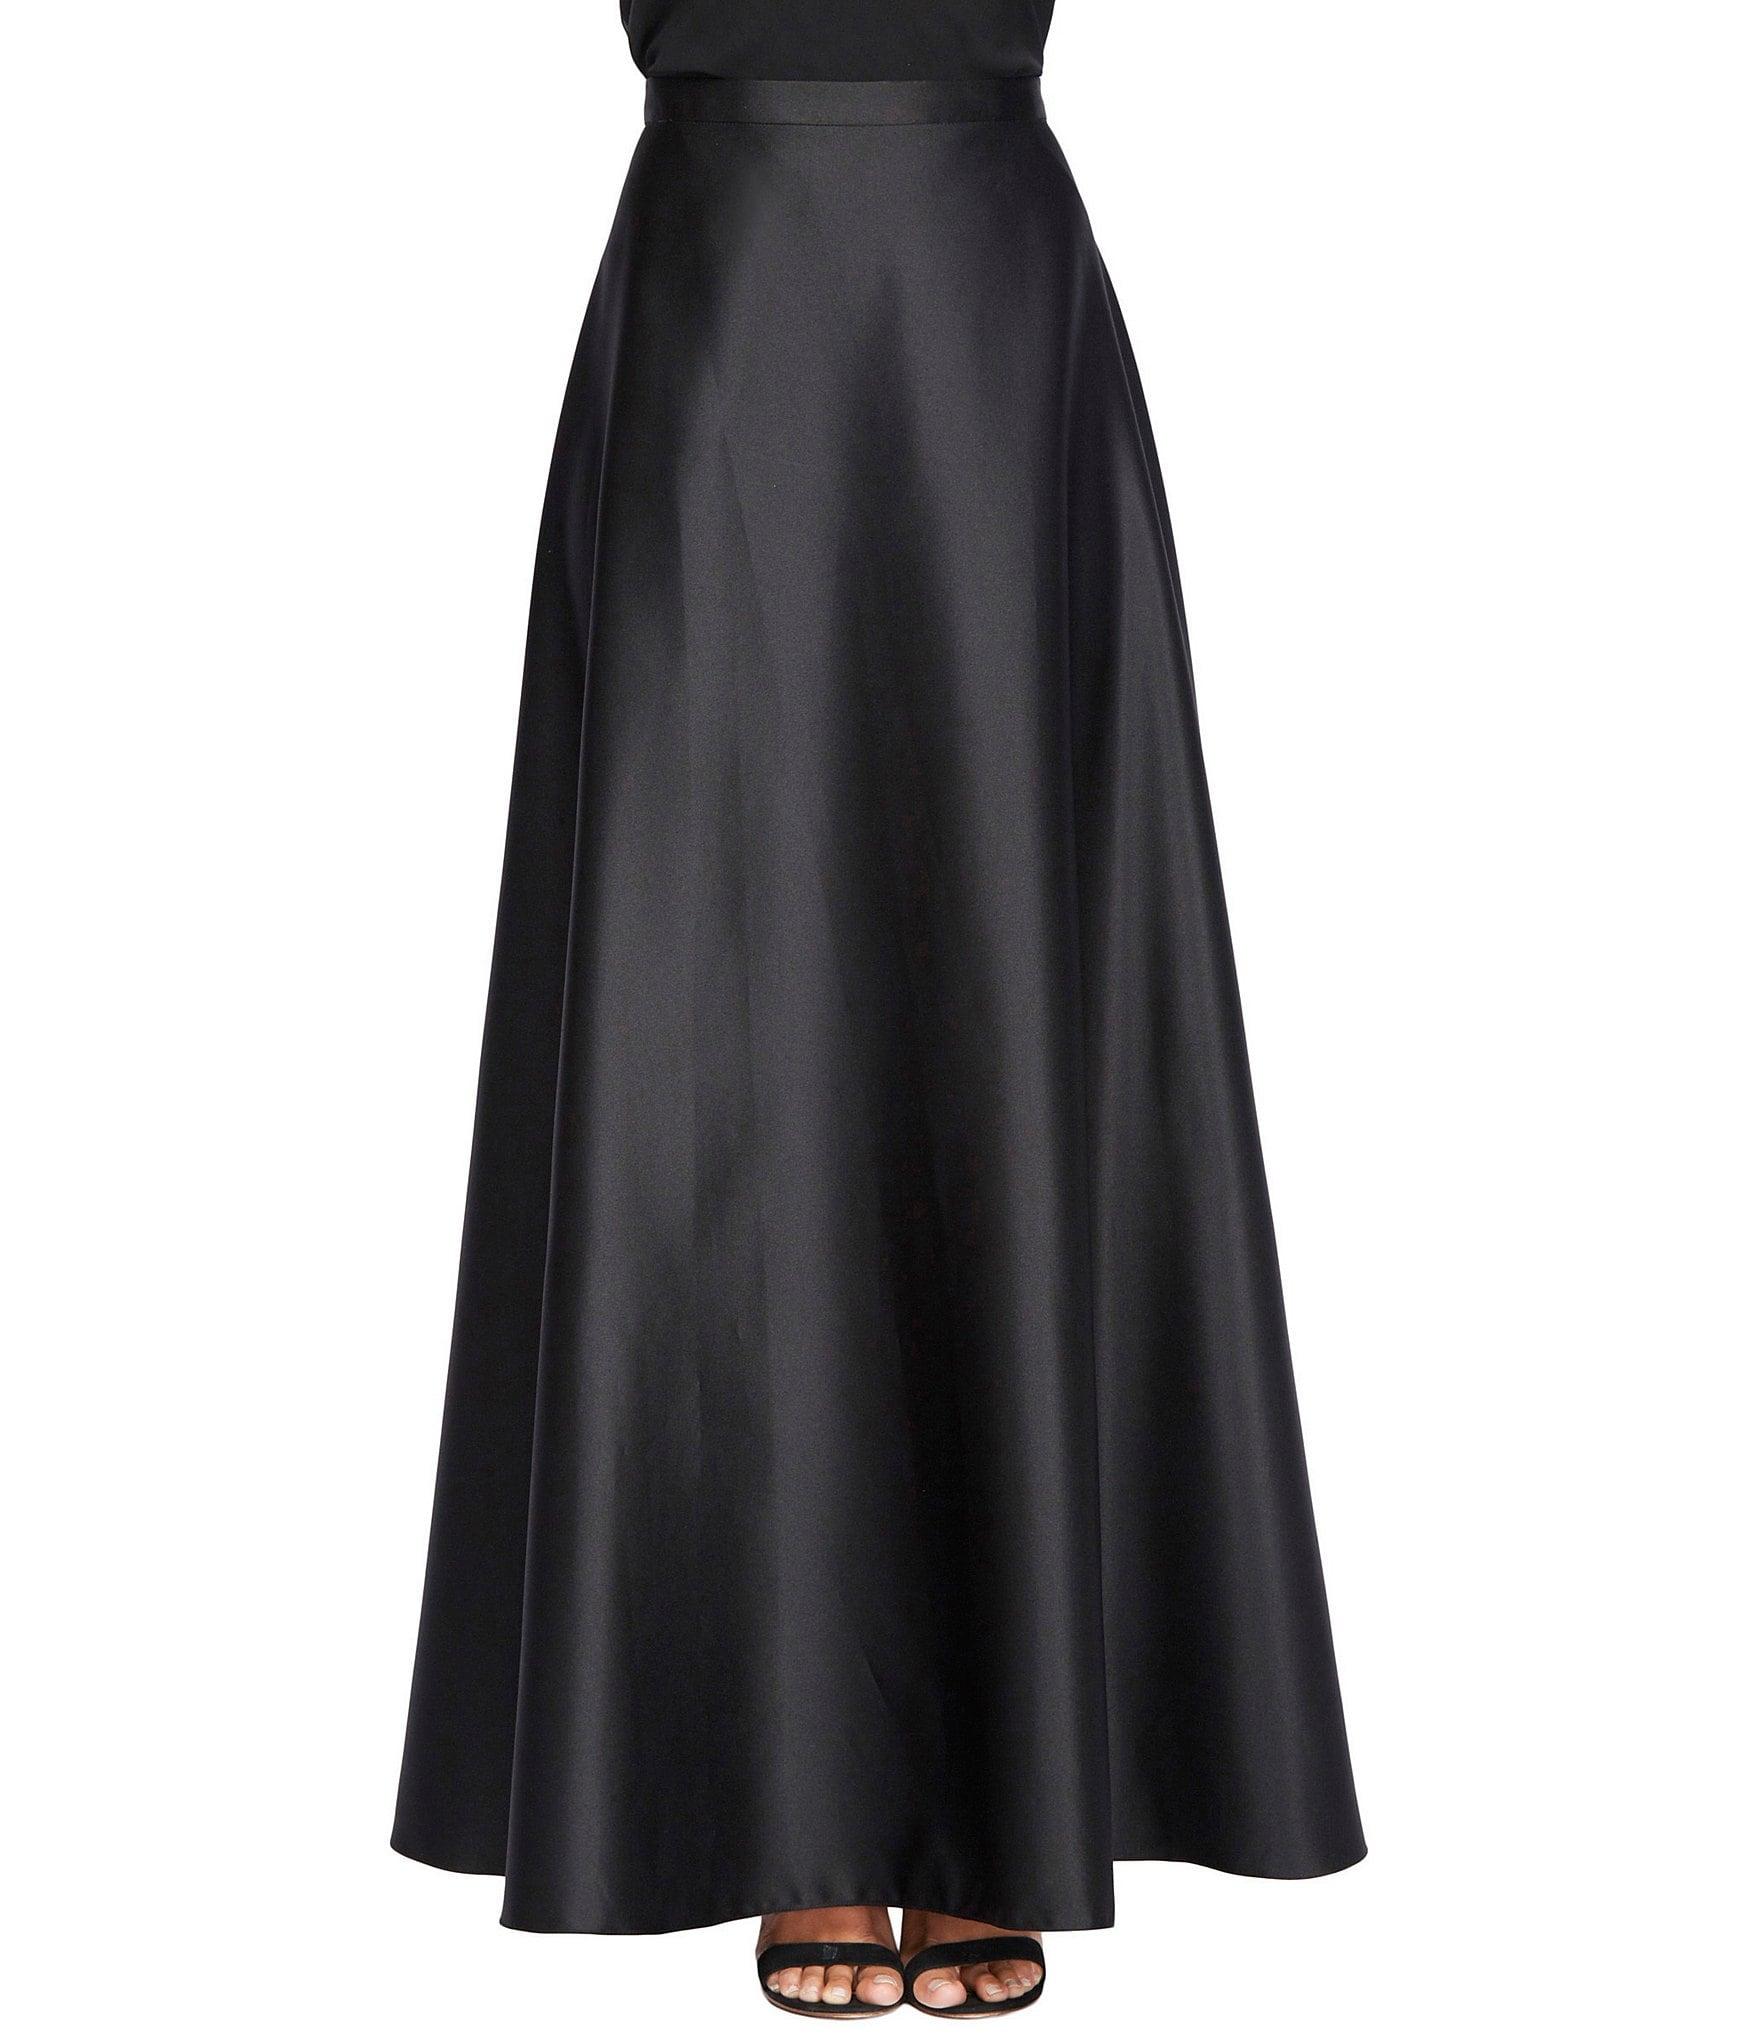 alex evenings satin skirt dillards